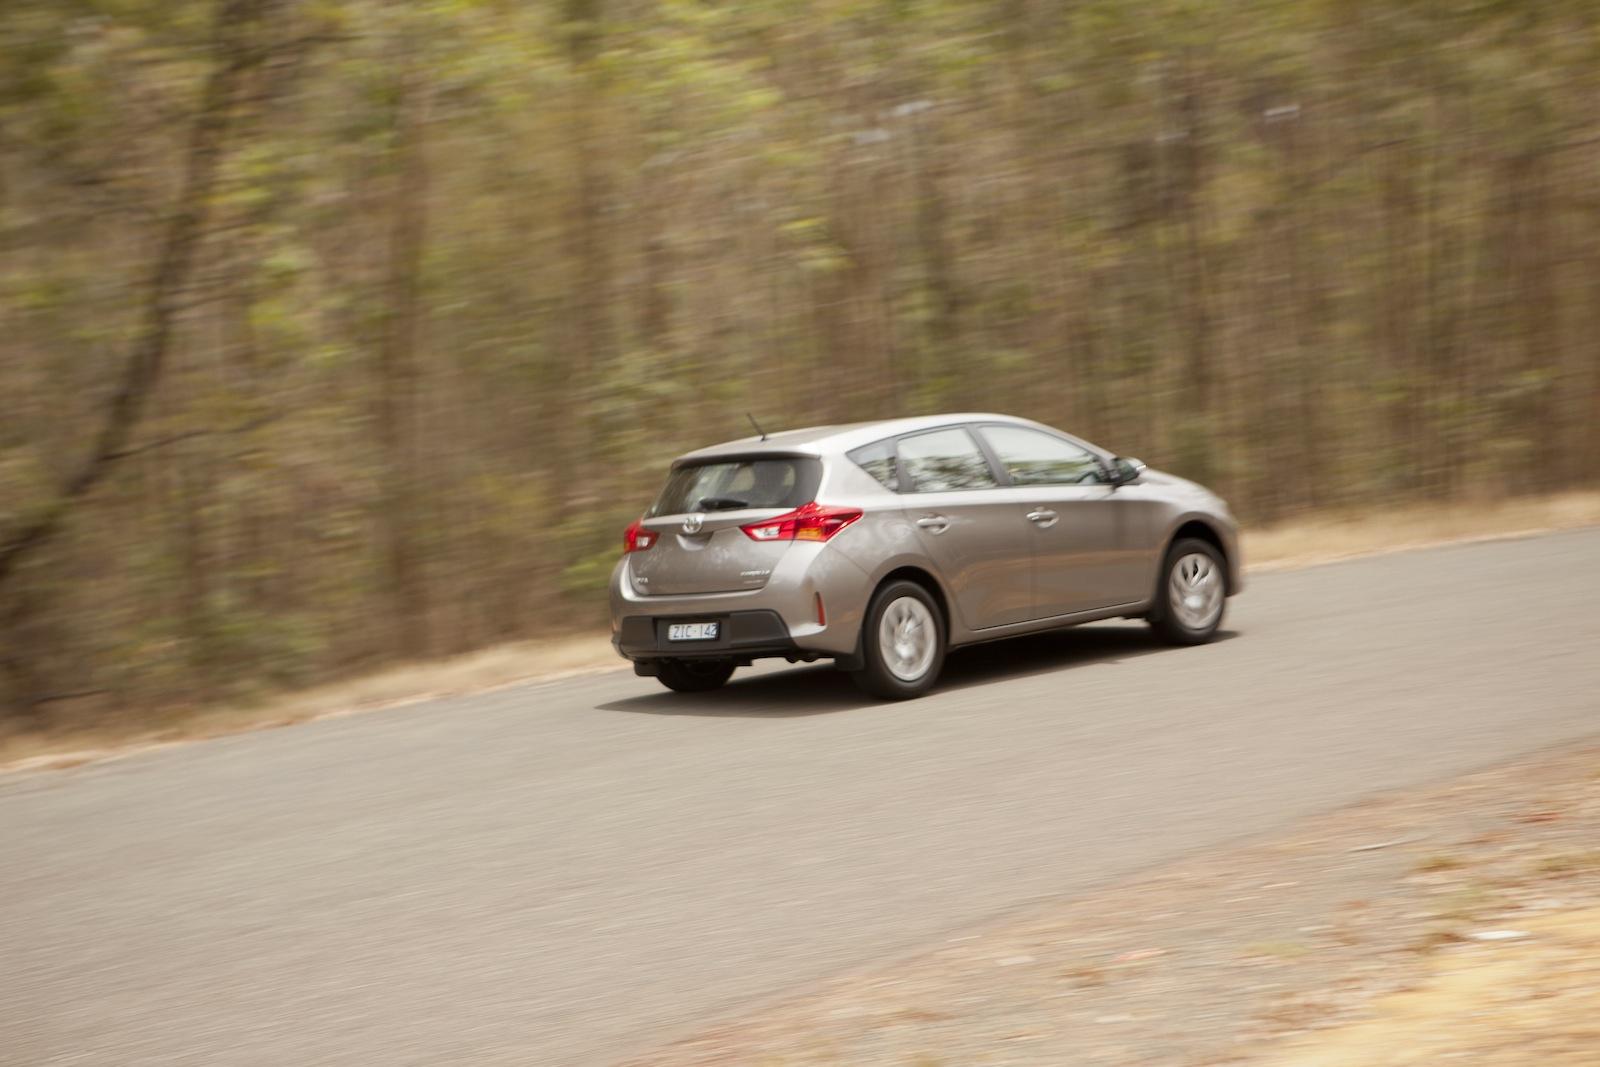 Simple  Toyota Hilux 2 Ford Ranger 3 Toyota Corolla 4 Hyundai I30 5 Mazda 3 6